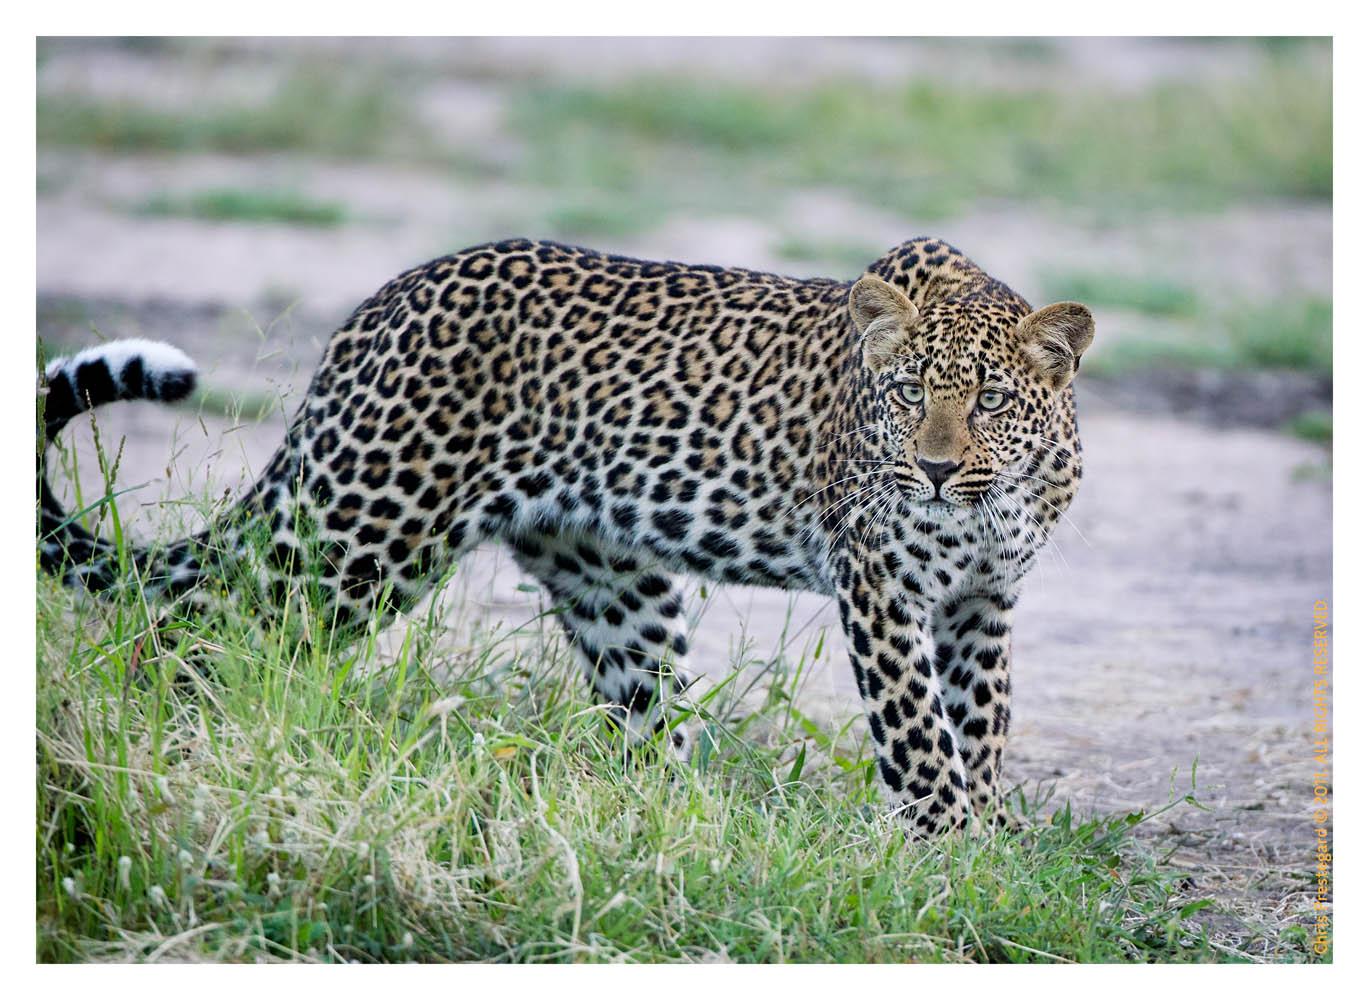 Leopard8912C_Apr21-2011